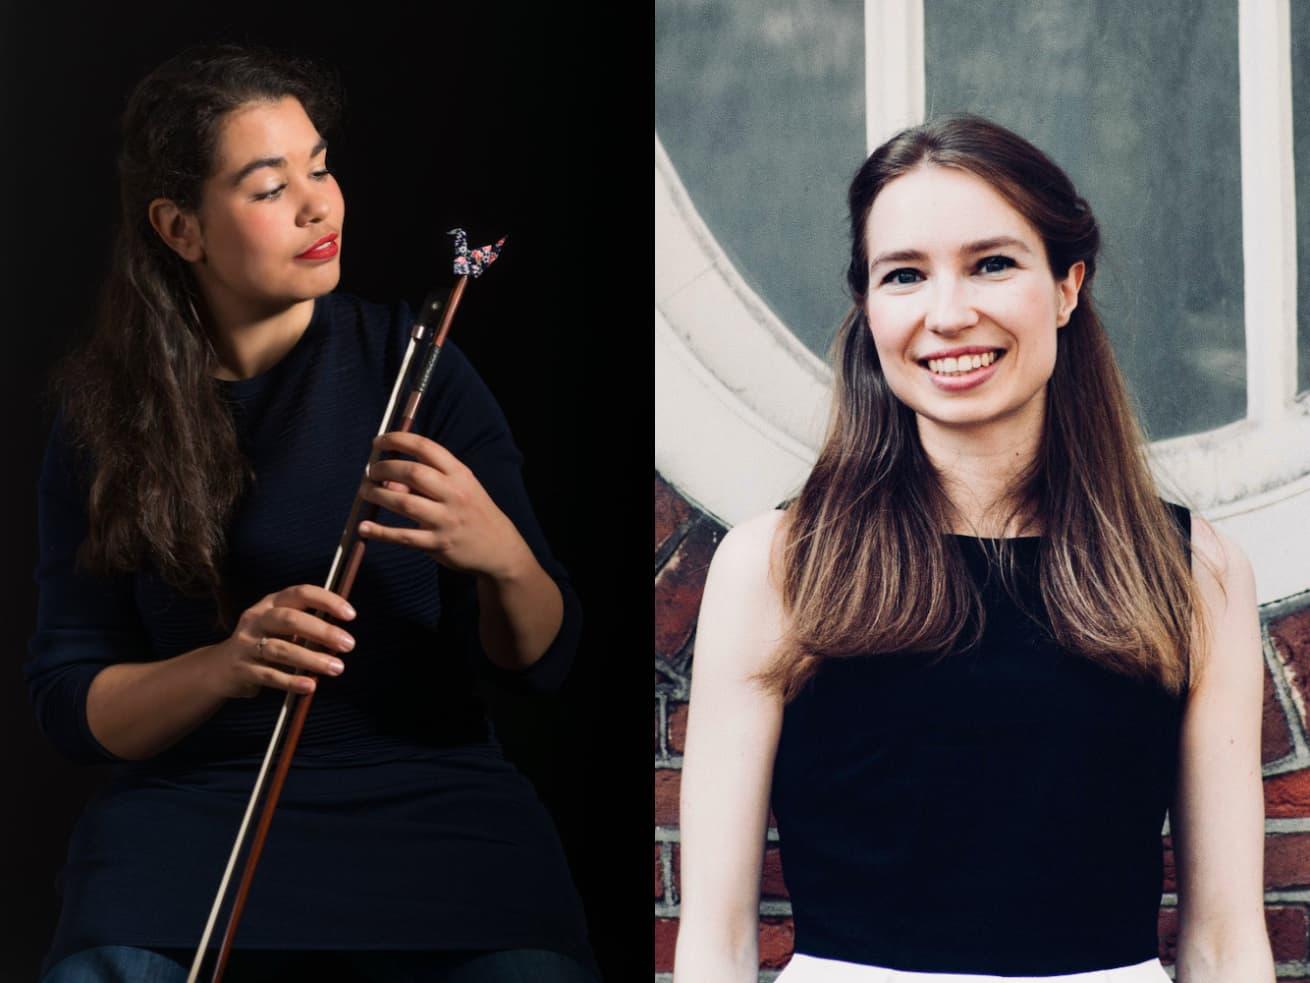 Willemijn Knödler, cello & Claudette Verhulst, piano